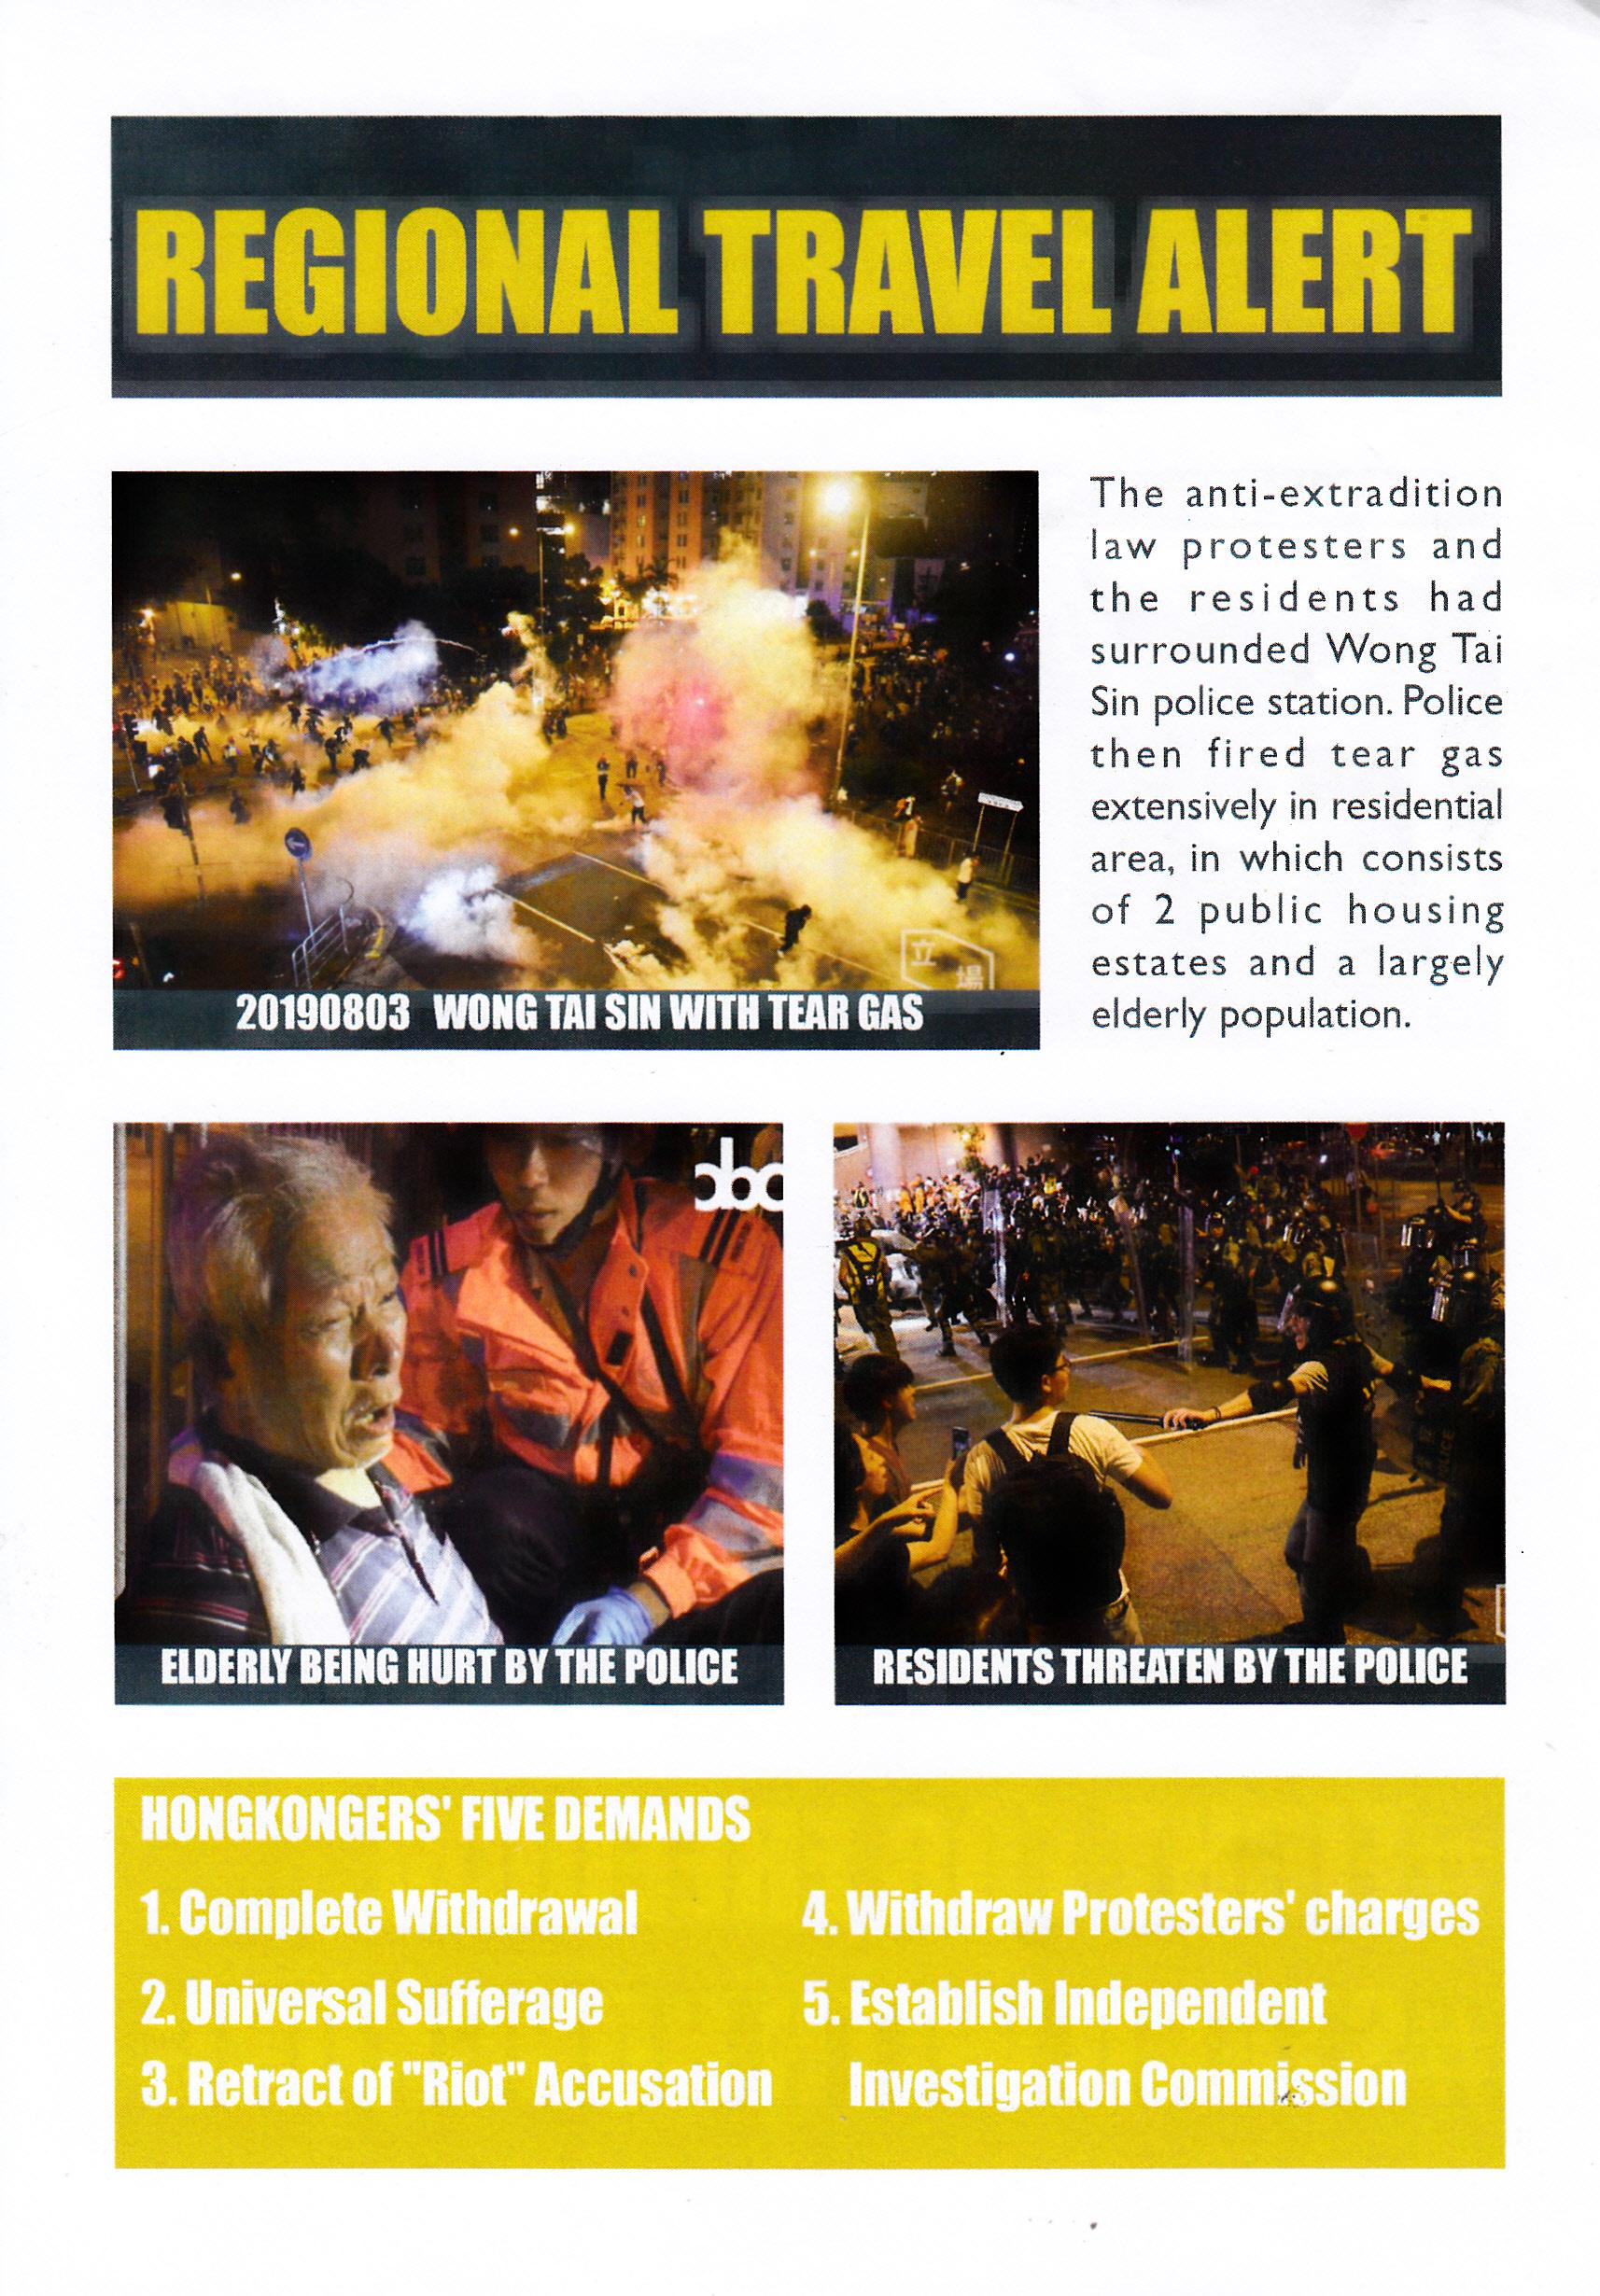 Hongkongers_five_demands_2019_0005